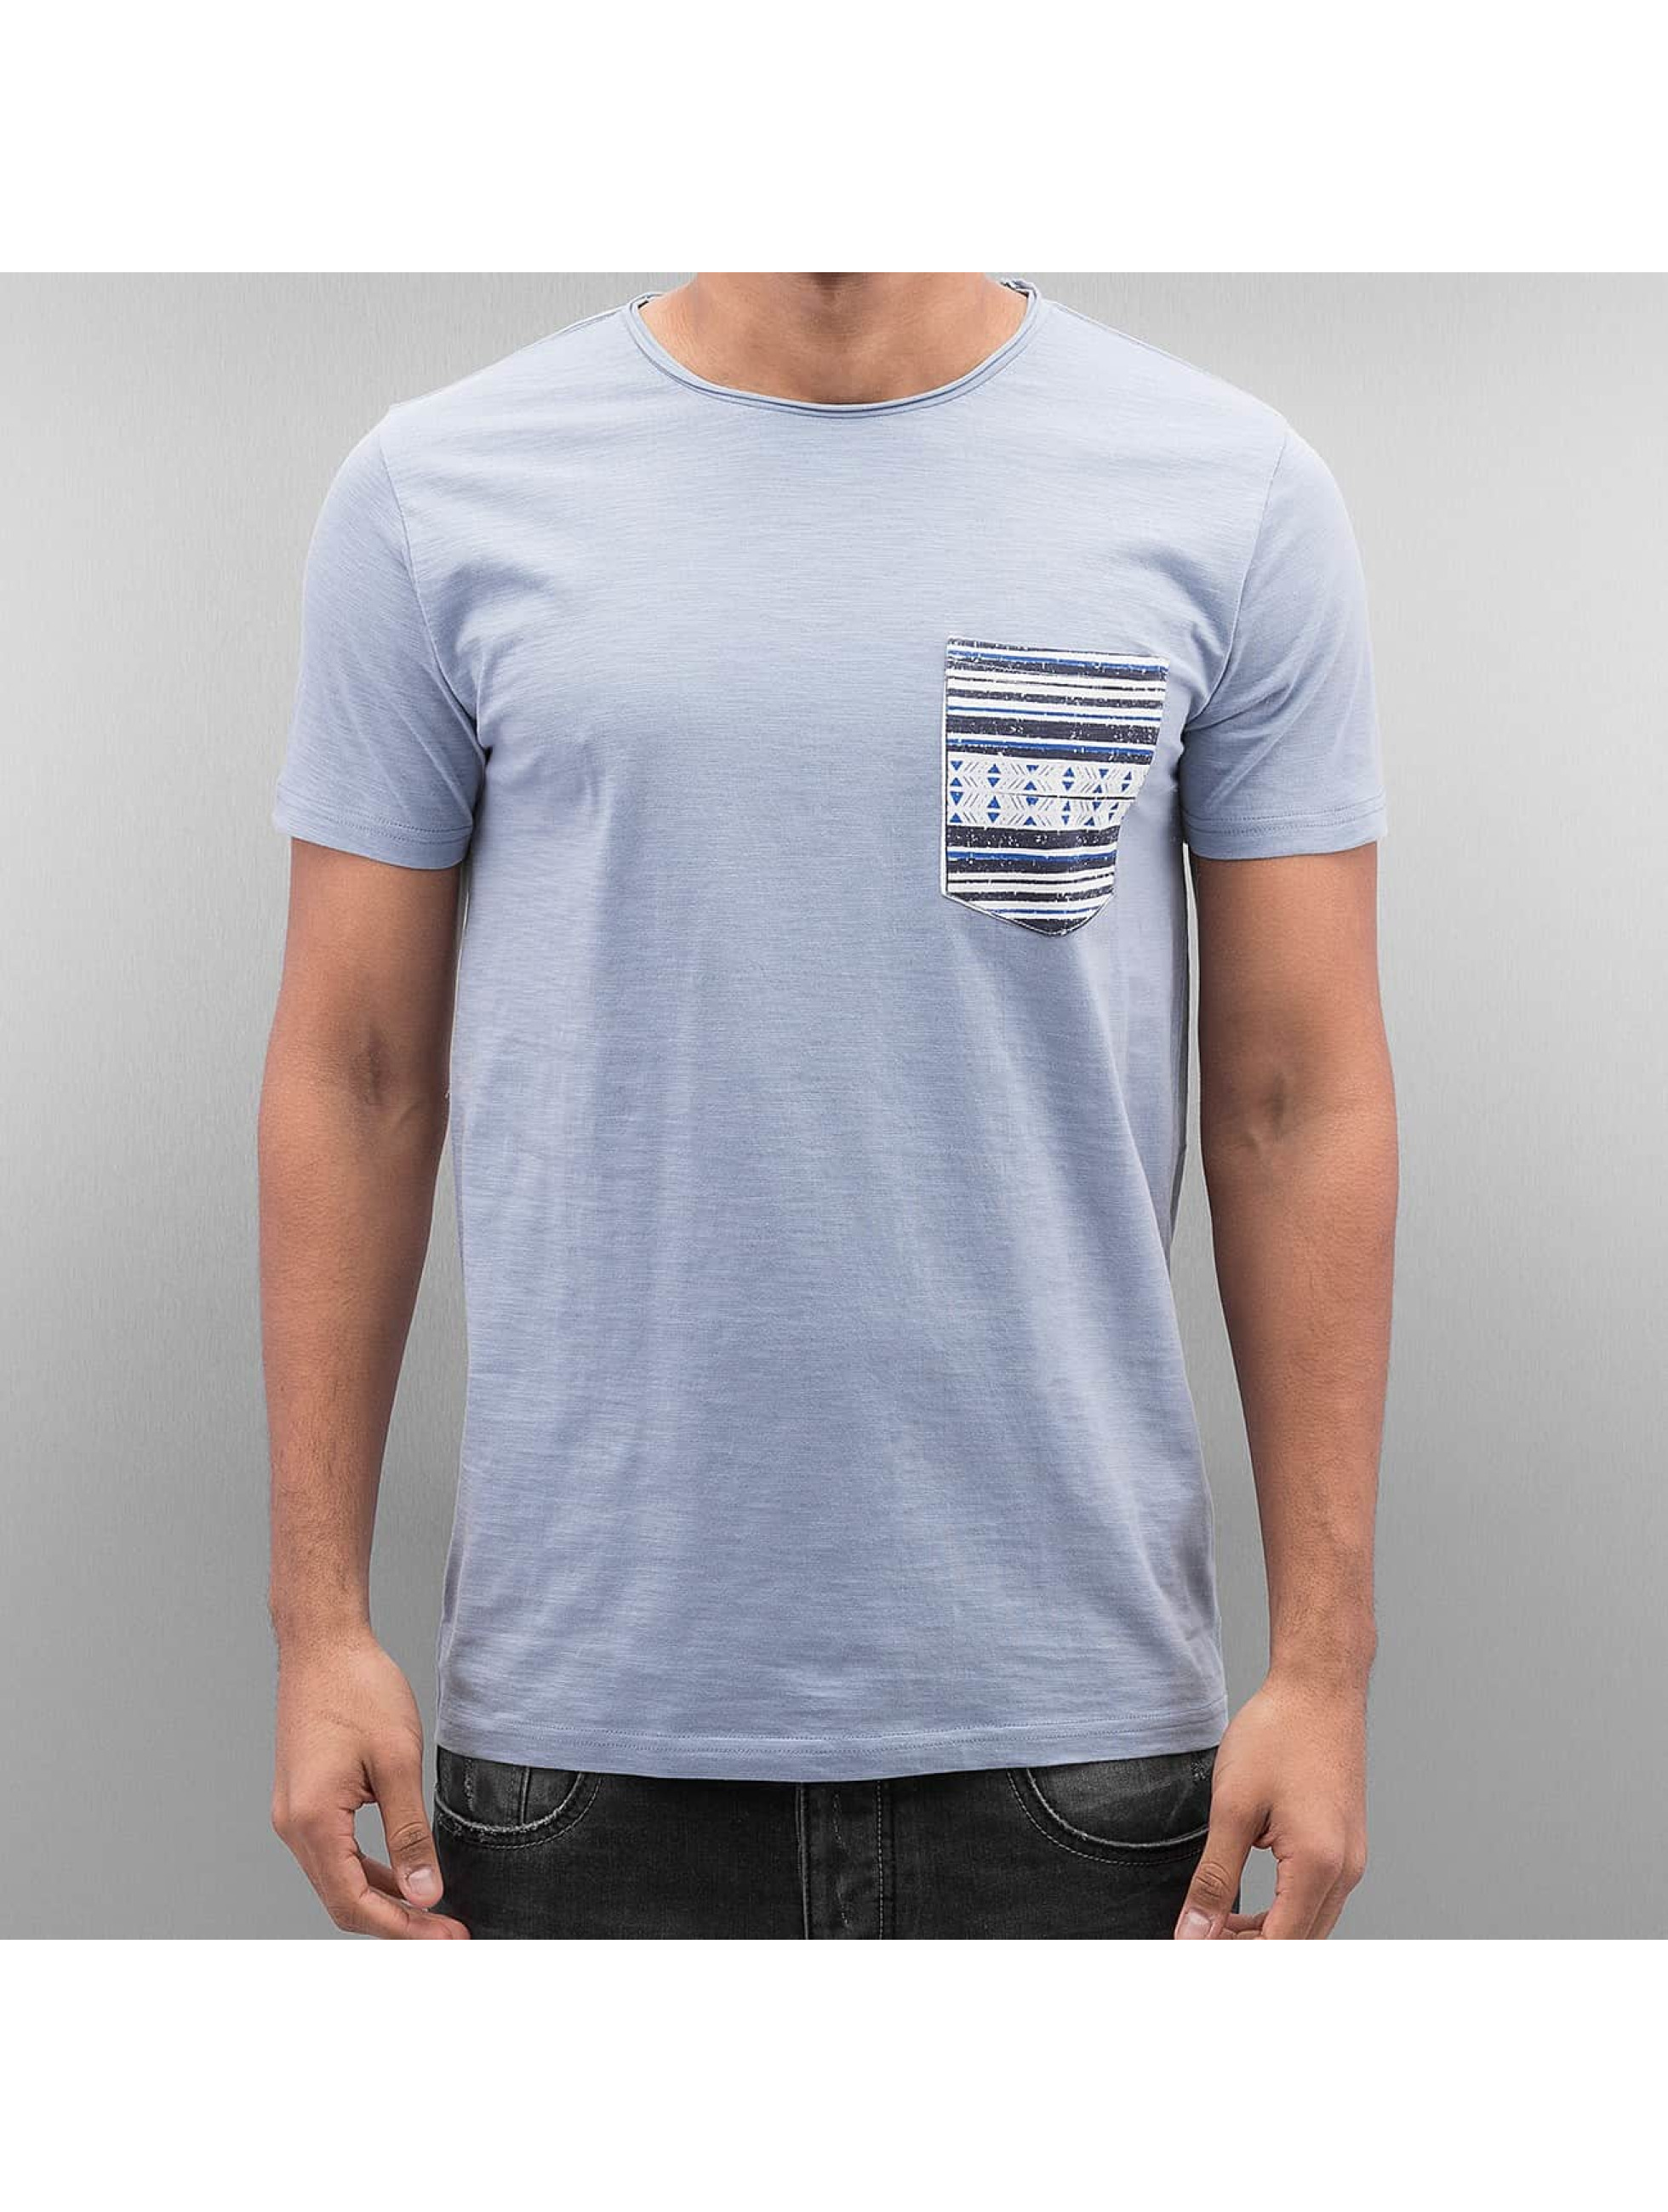 SHINE Original Männer T-Shirt Pocket in blau